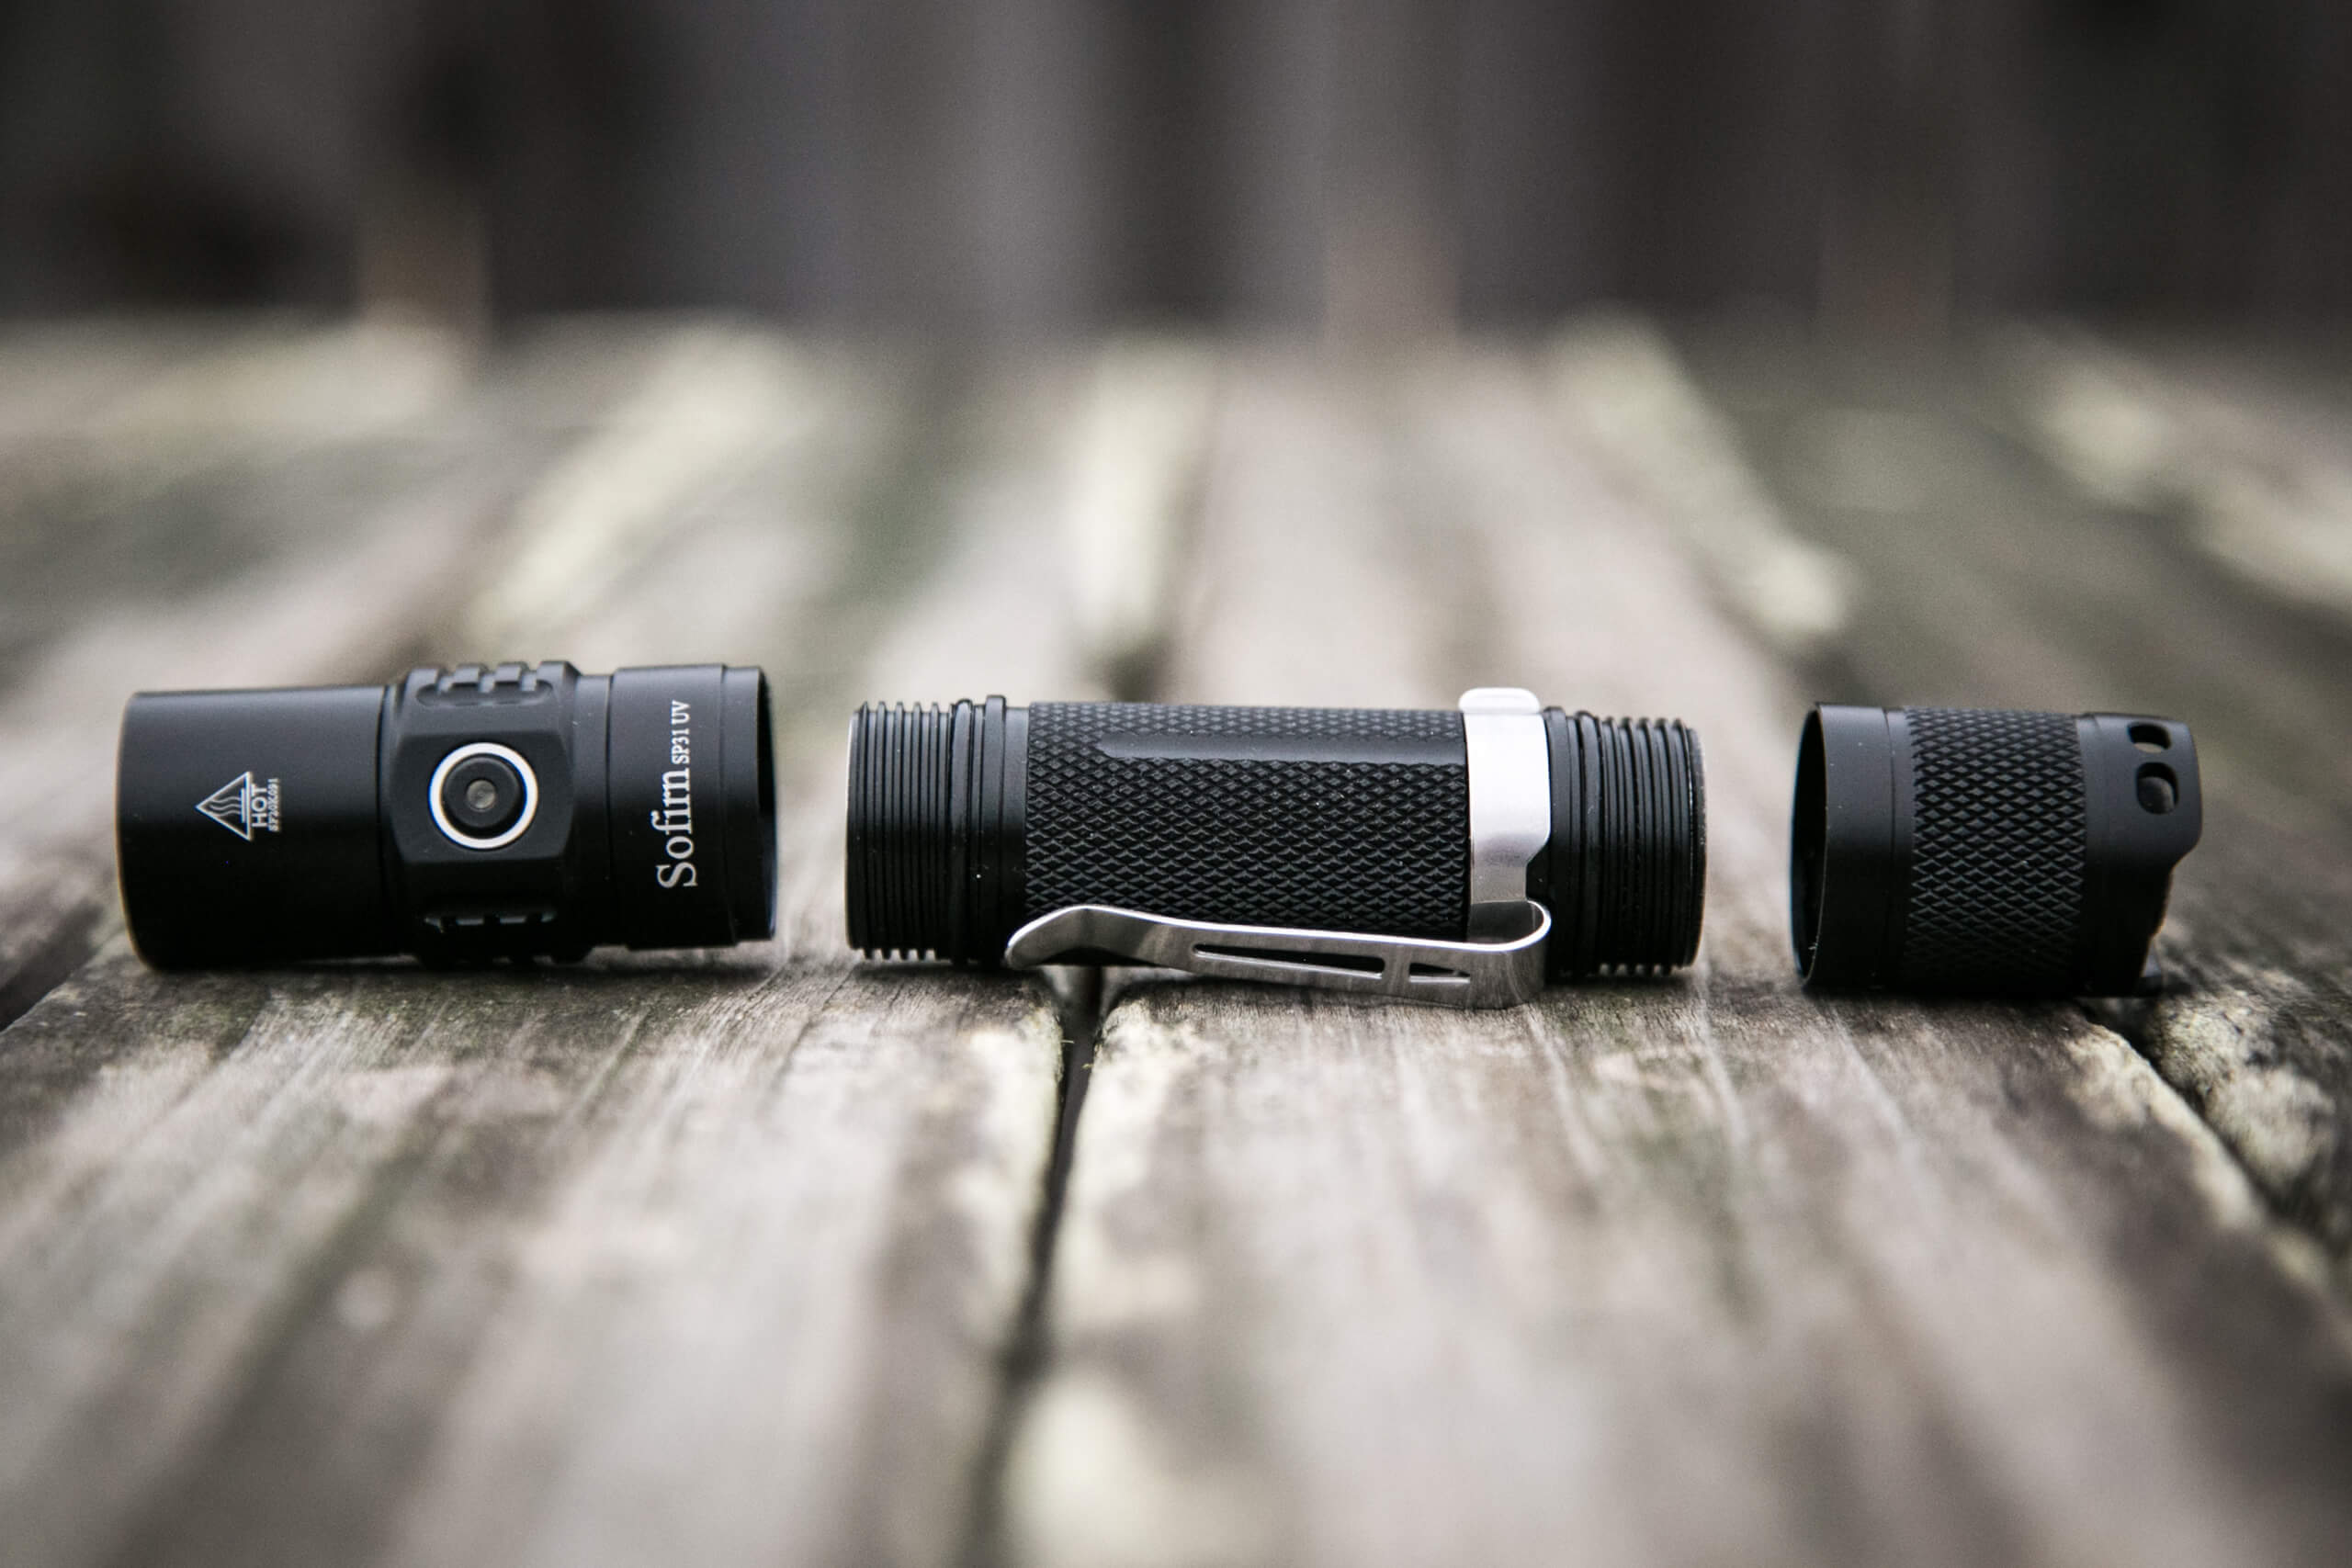 sofirn sp31uv ultraviolet 18650 flashlight head and tail off